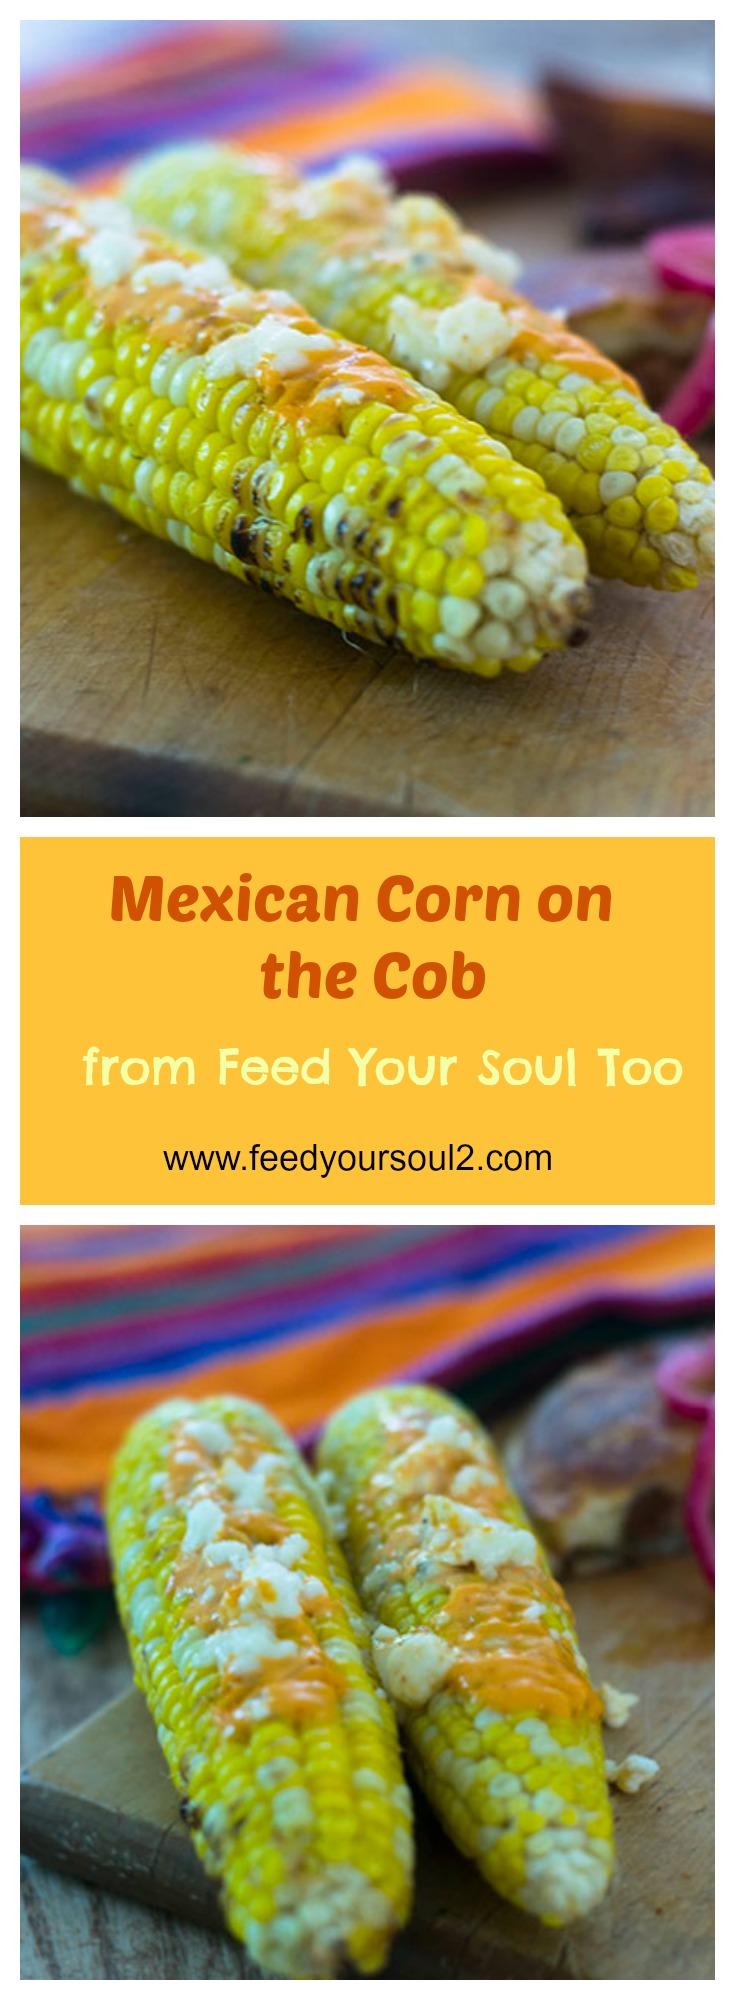 Mexican Corn on the Cob #vegetarian #Mexicanfood #corn | feedyoursoul2.com